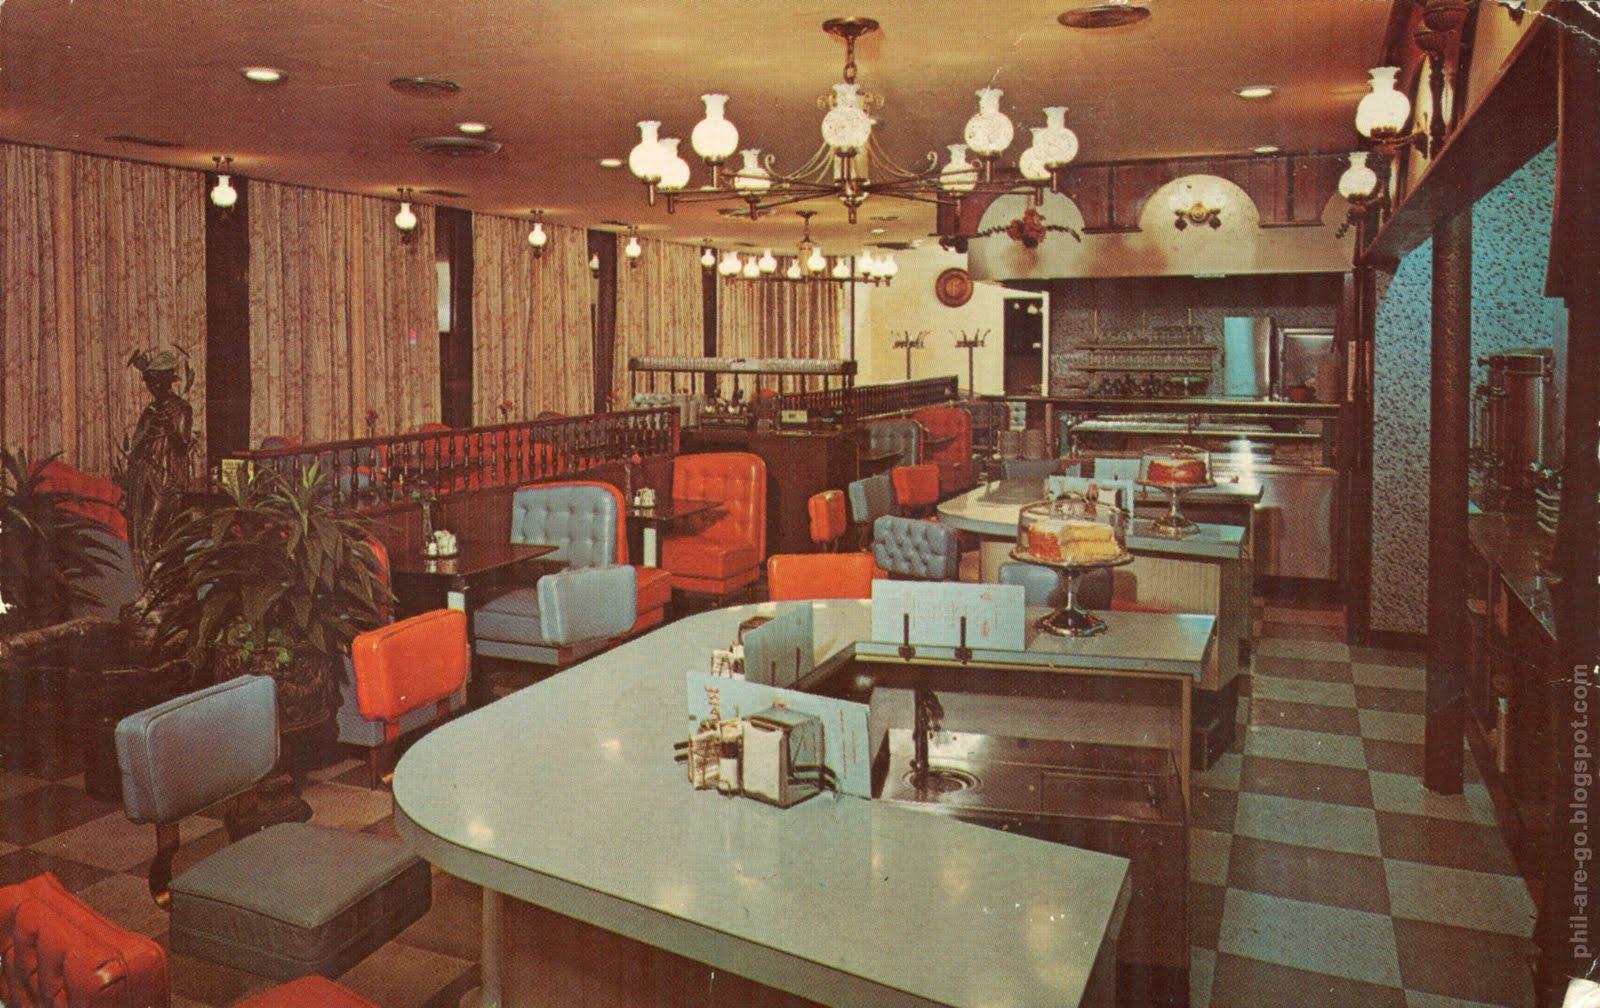 Paradise Restaurant Elmhurst Illinois Call Me Sugar Toots